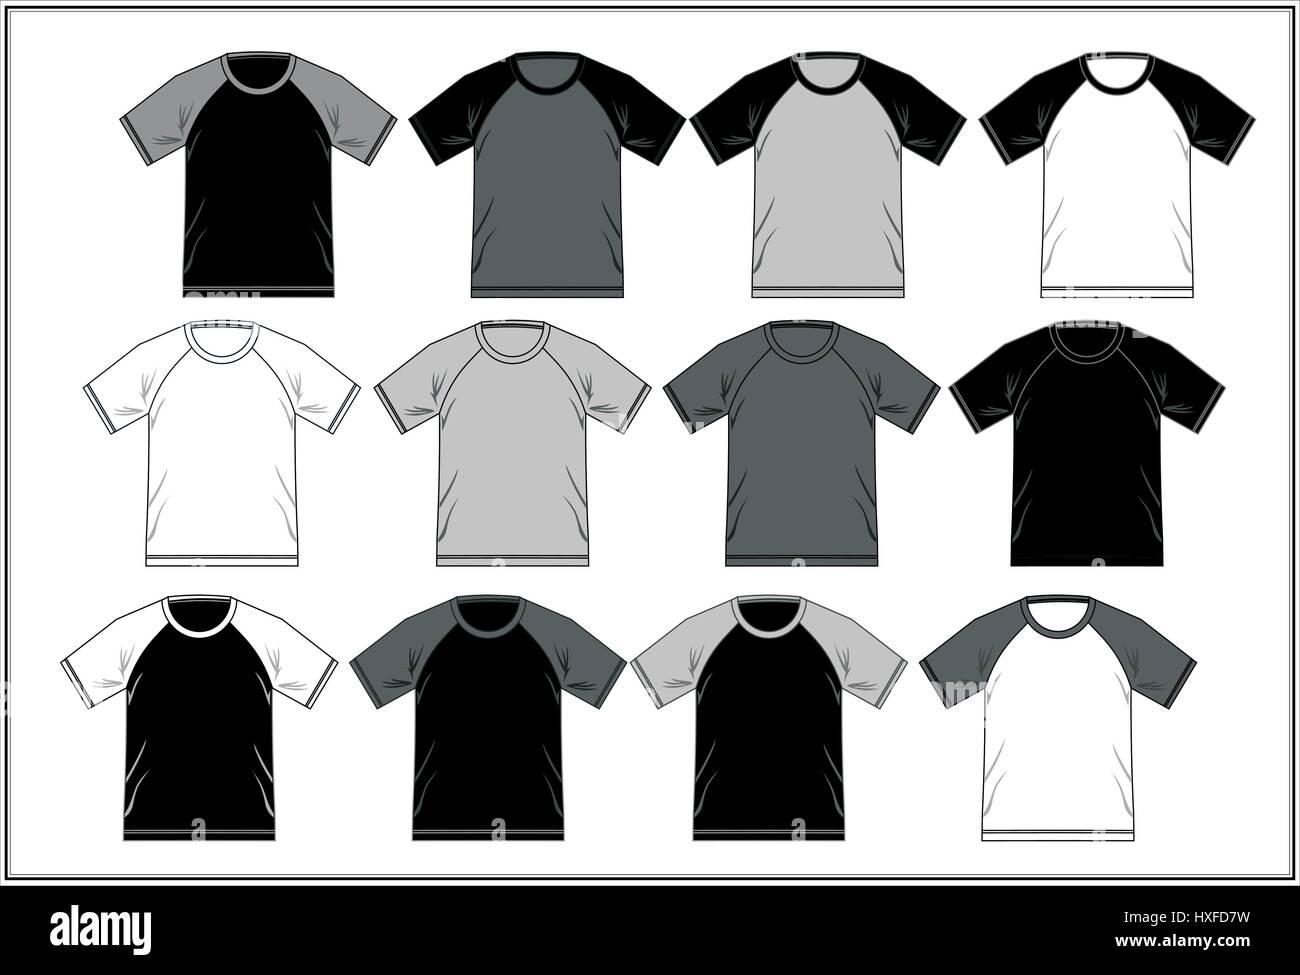 T Shirt Template Raglan Black White Vector Stock Vector Image Art Alamy